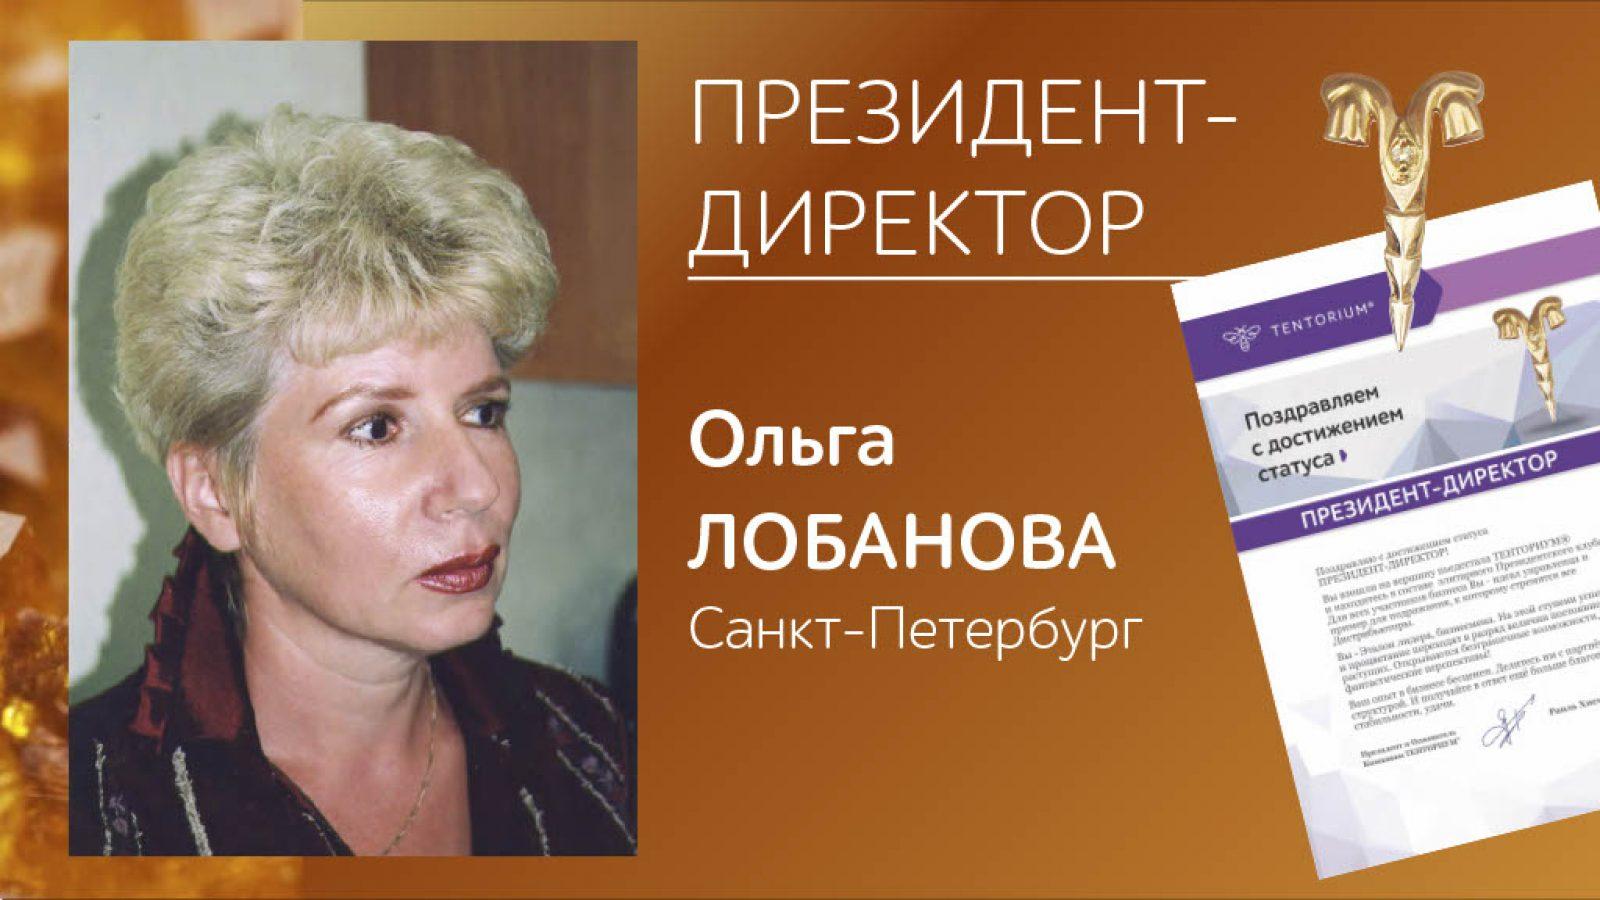 SHTV-2020-_-E-TL-TBTV-TVTGTBTL-TL-TB-TB-_69-TBTVTA1024_66